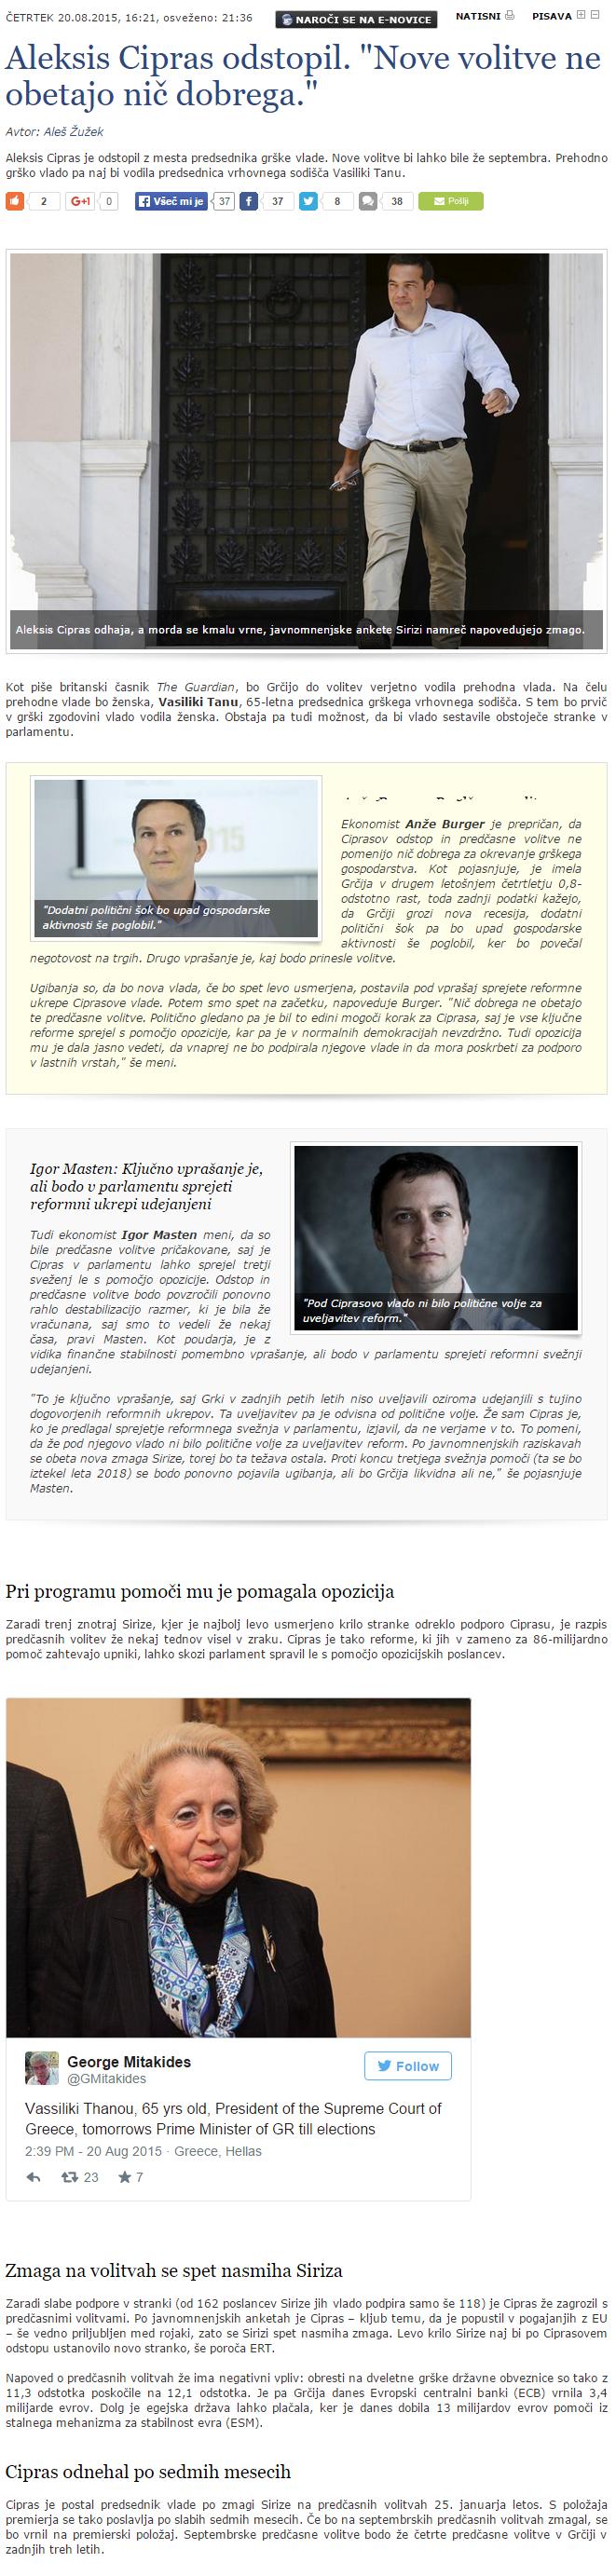 screencapture-www-siol-net-novice-svet-2015-08-cipras_volitve-aspx-1443090800103